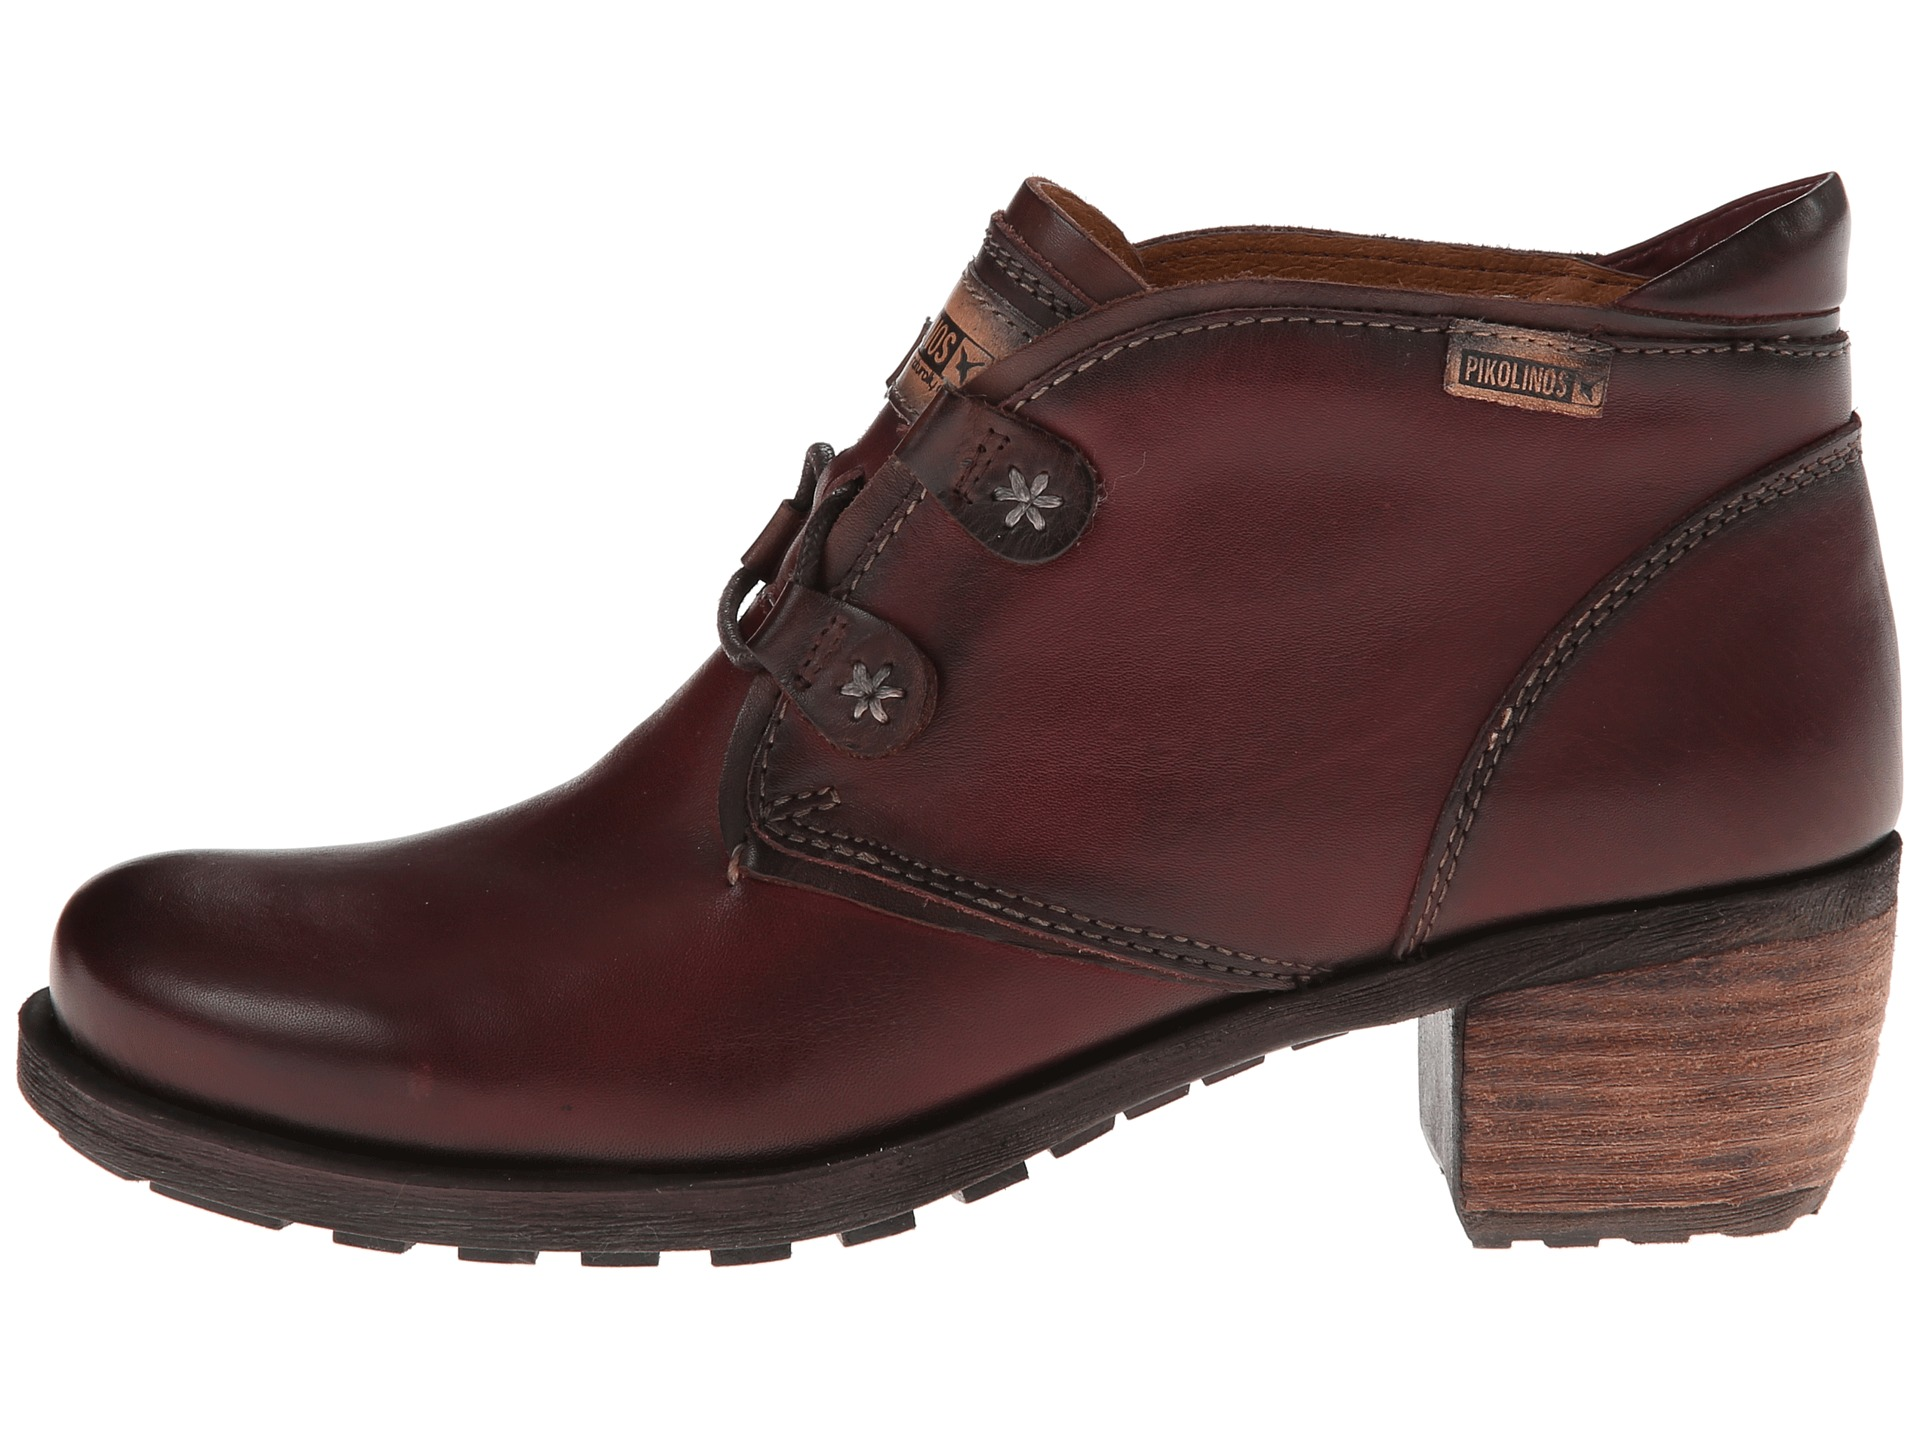 Pikolinos Shoes Men Images